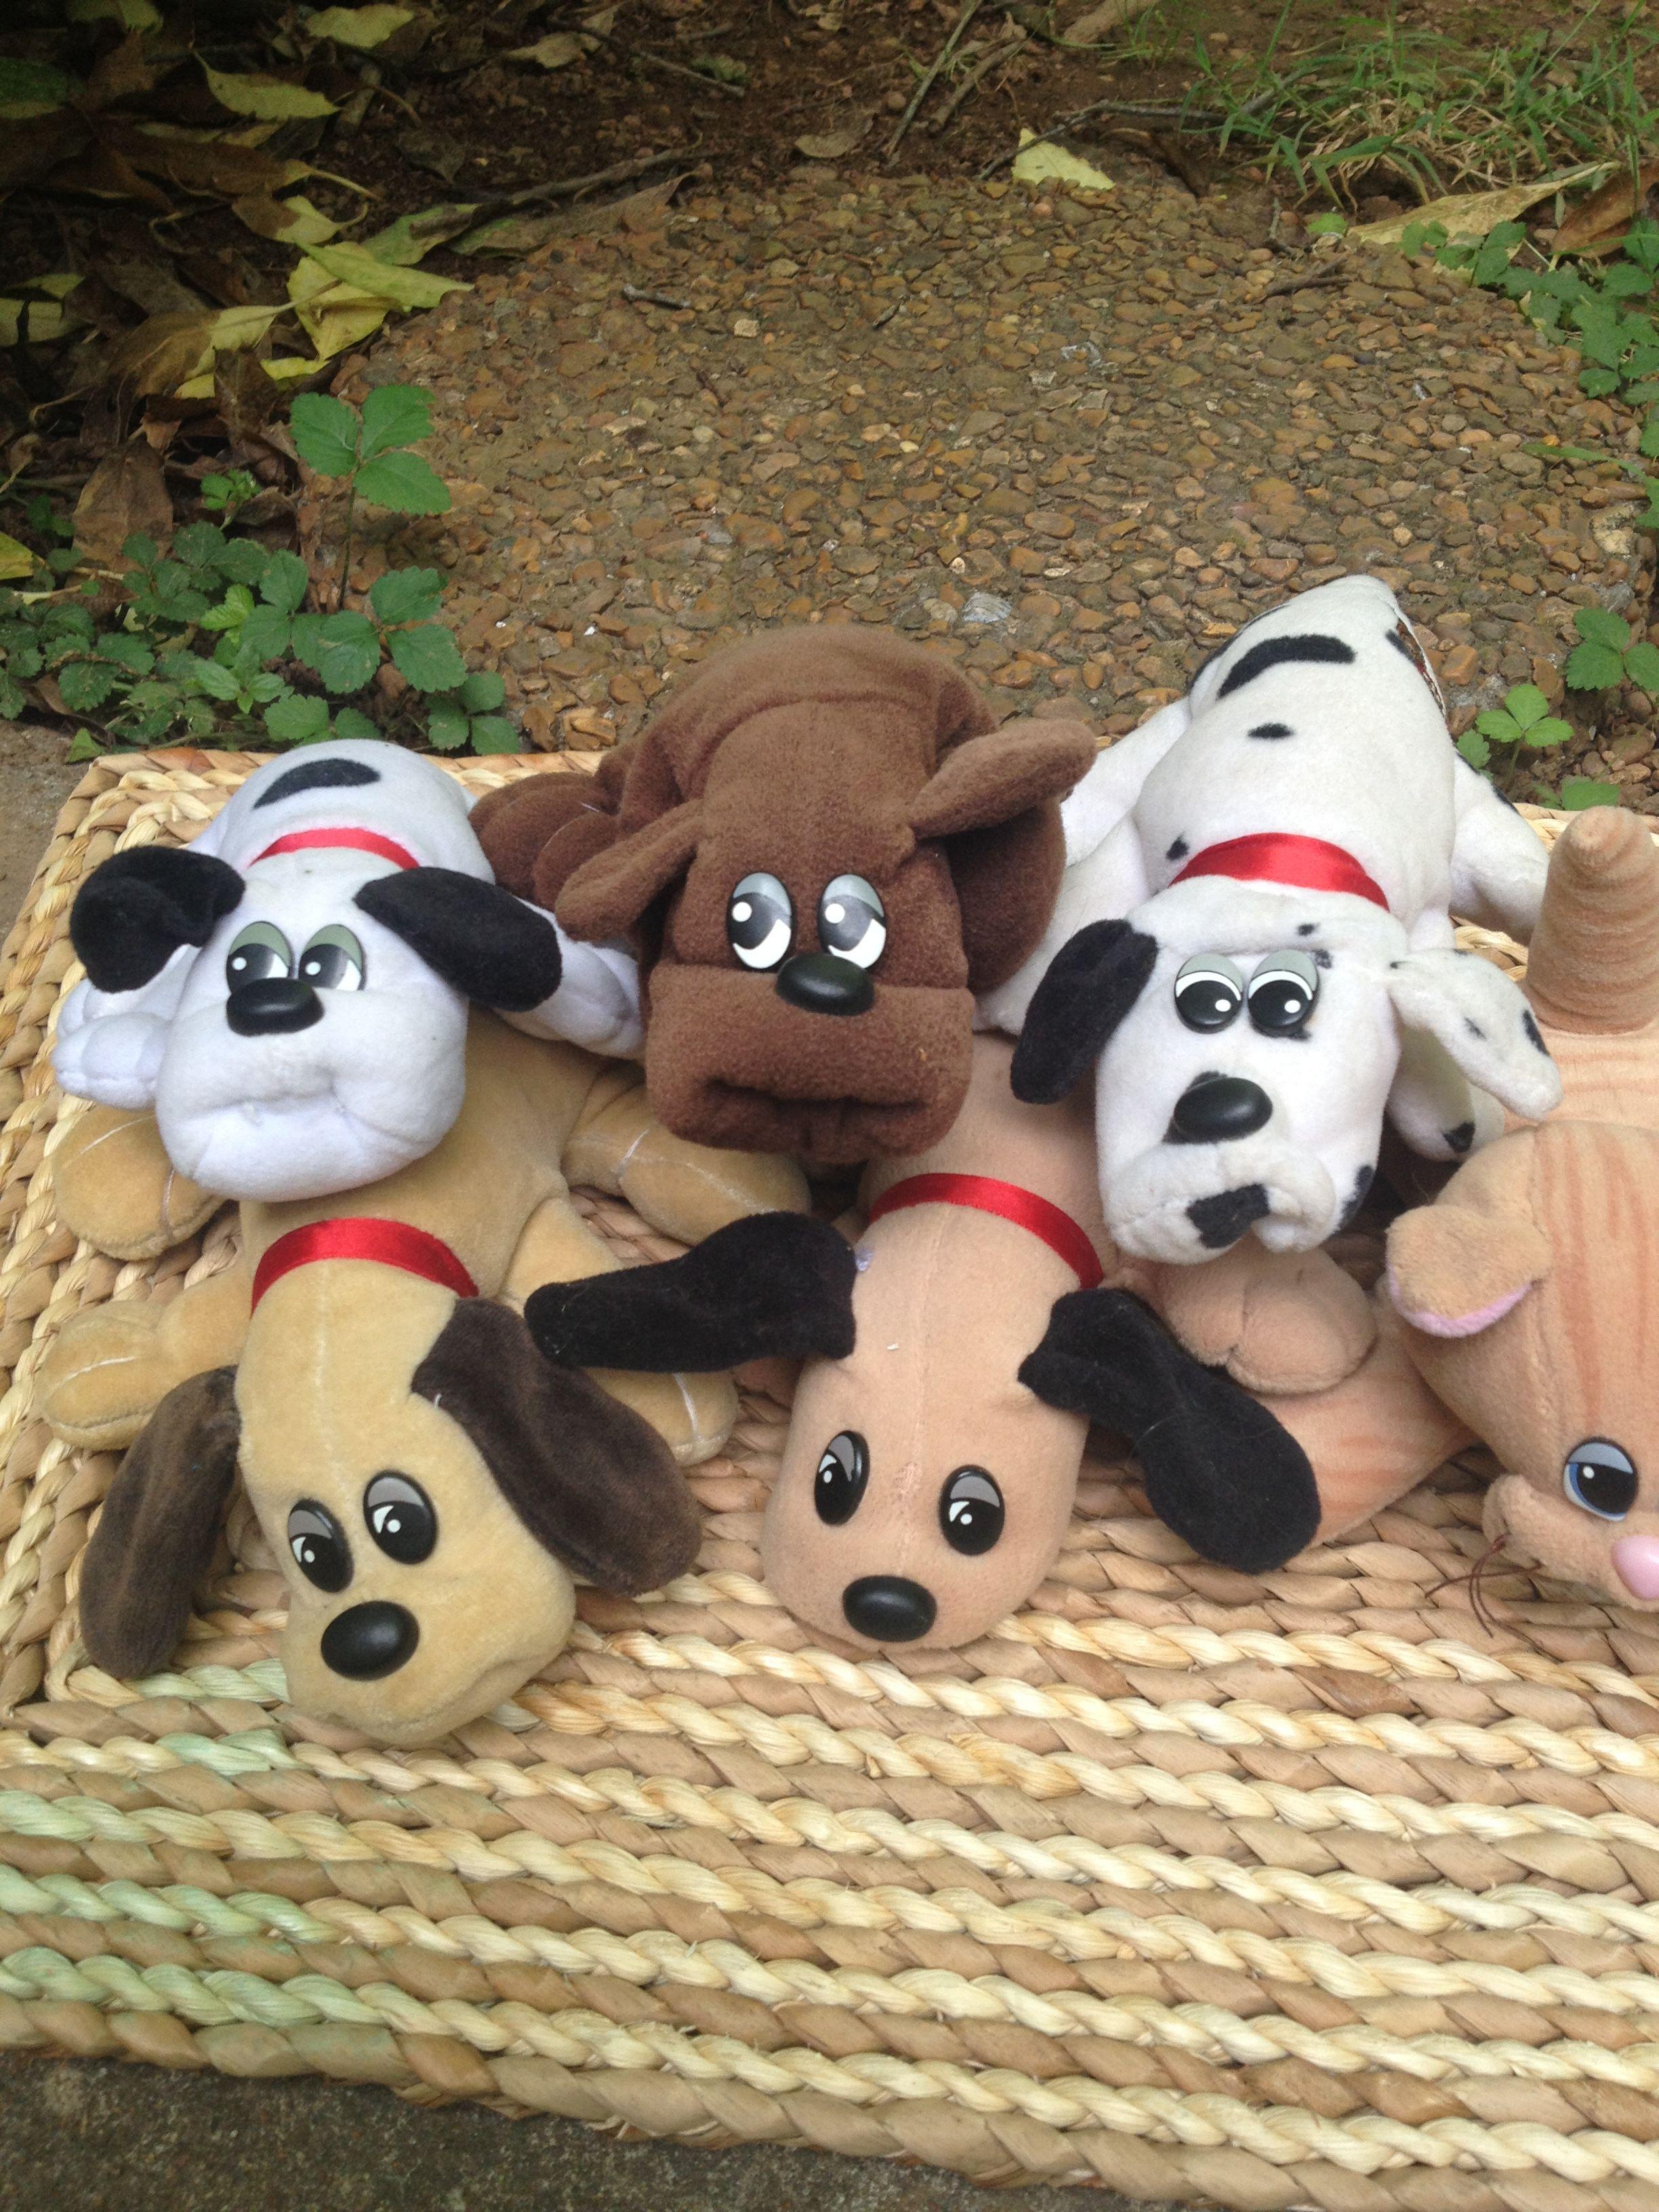 80s90s Pound Puppies Pound puppies, Puppies, Plush toys